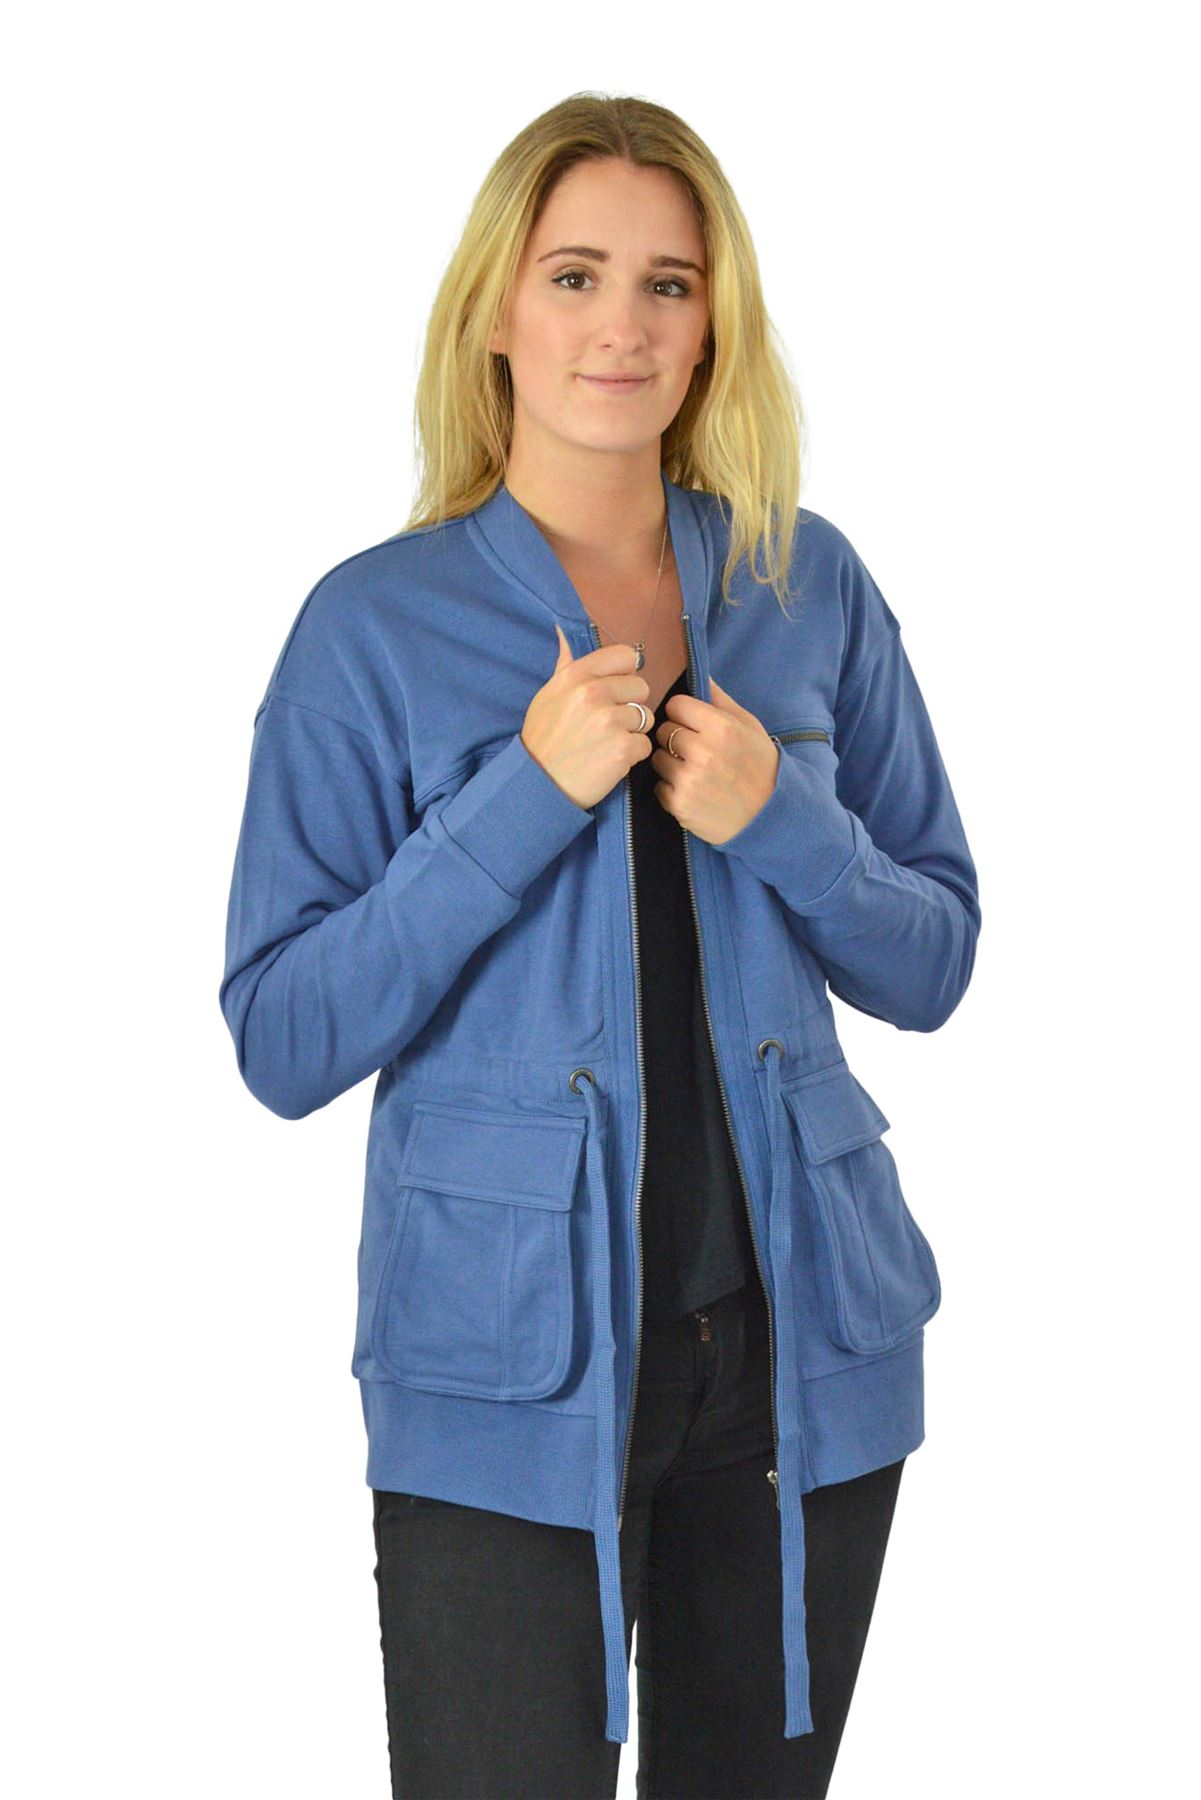 N*XT Zip Front Long Sweatshirt Jacket New Sizes 8-22